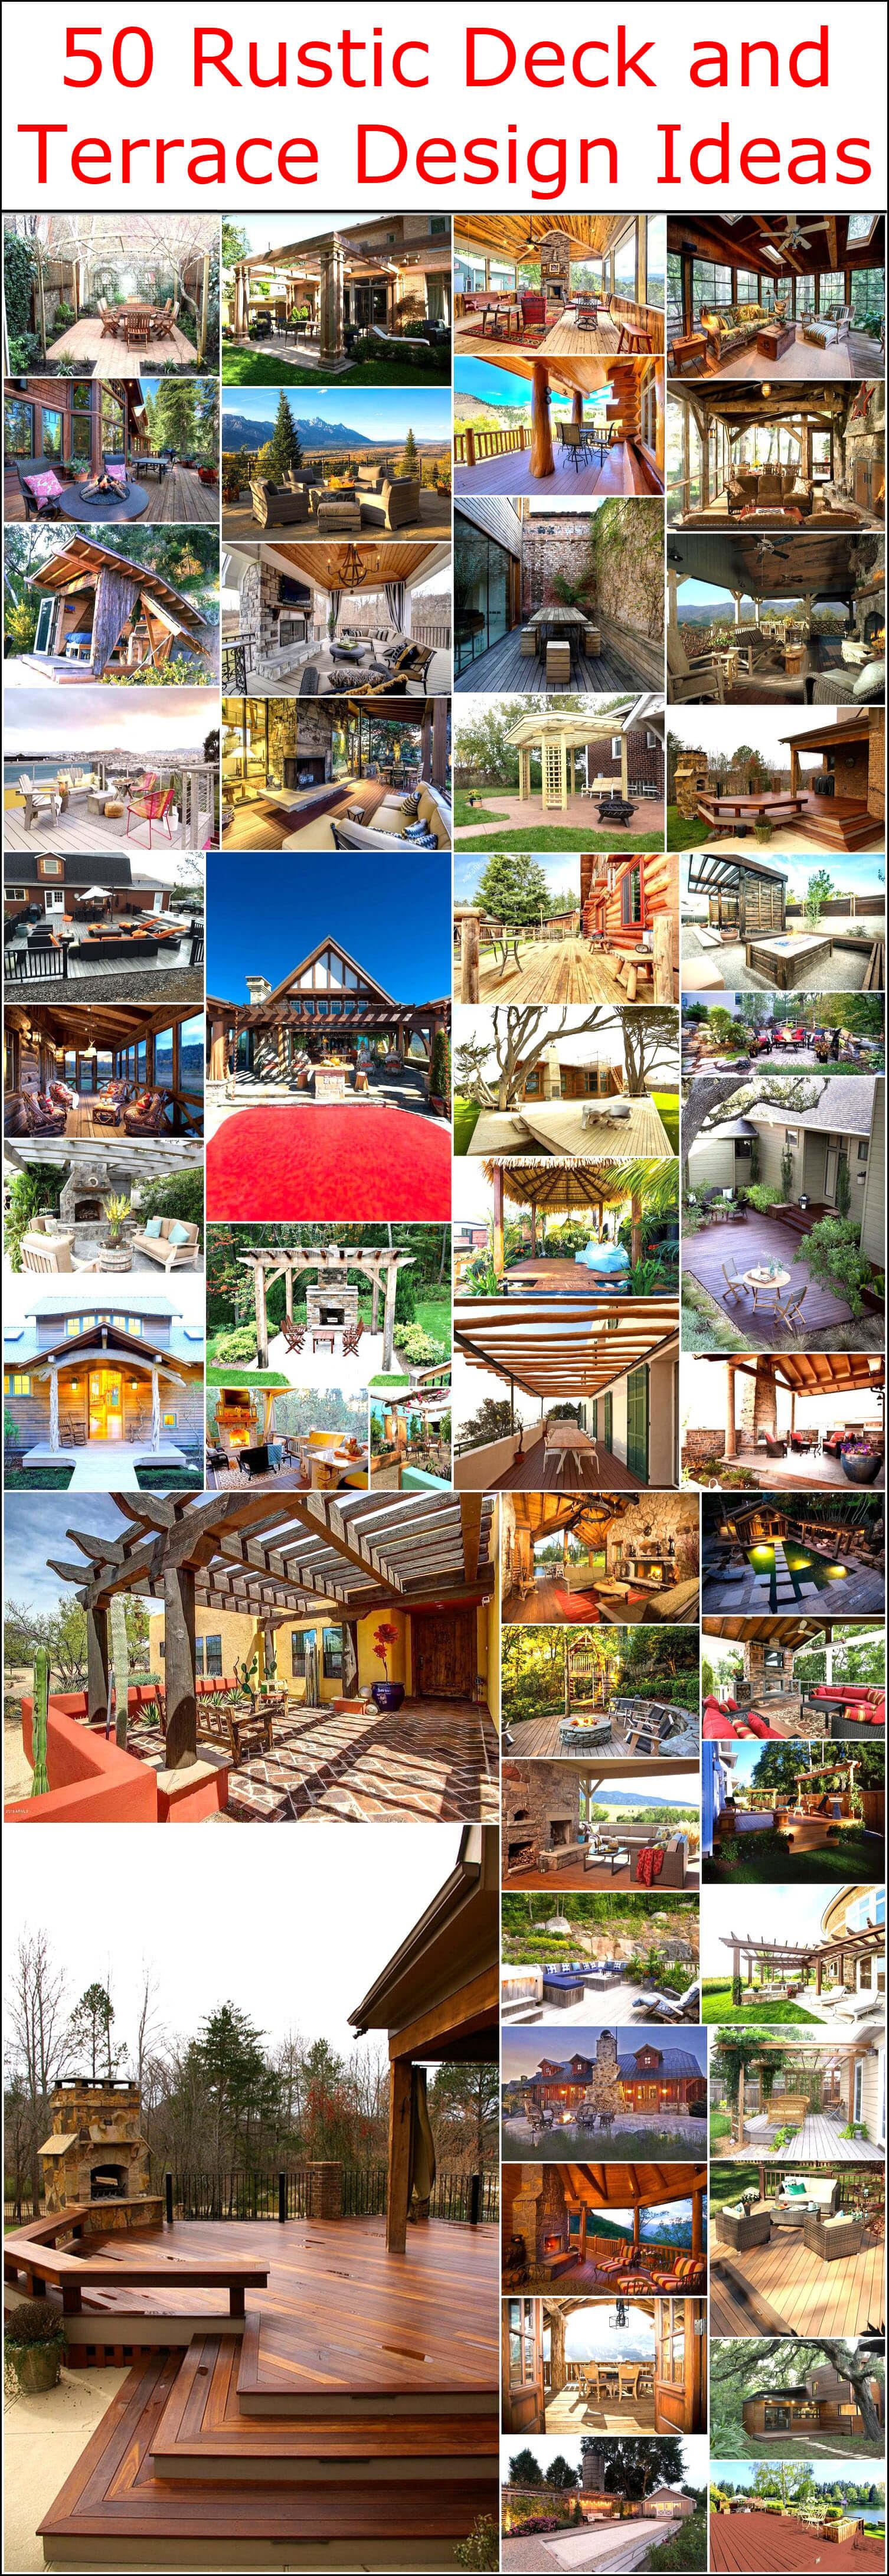 50 Rustic Deck And Terrace Design Ideas Rustic Home Decor And Design Ideas